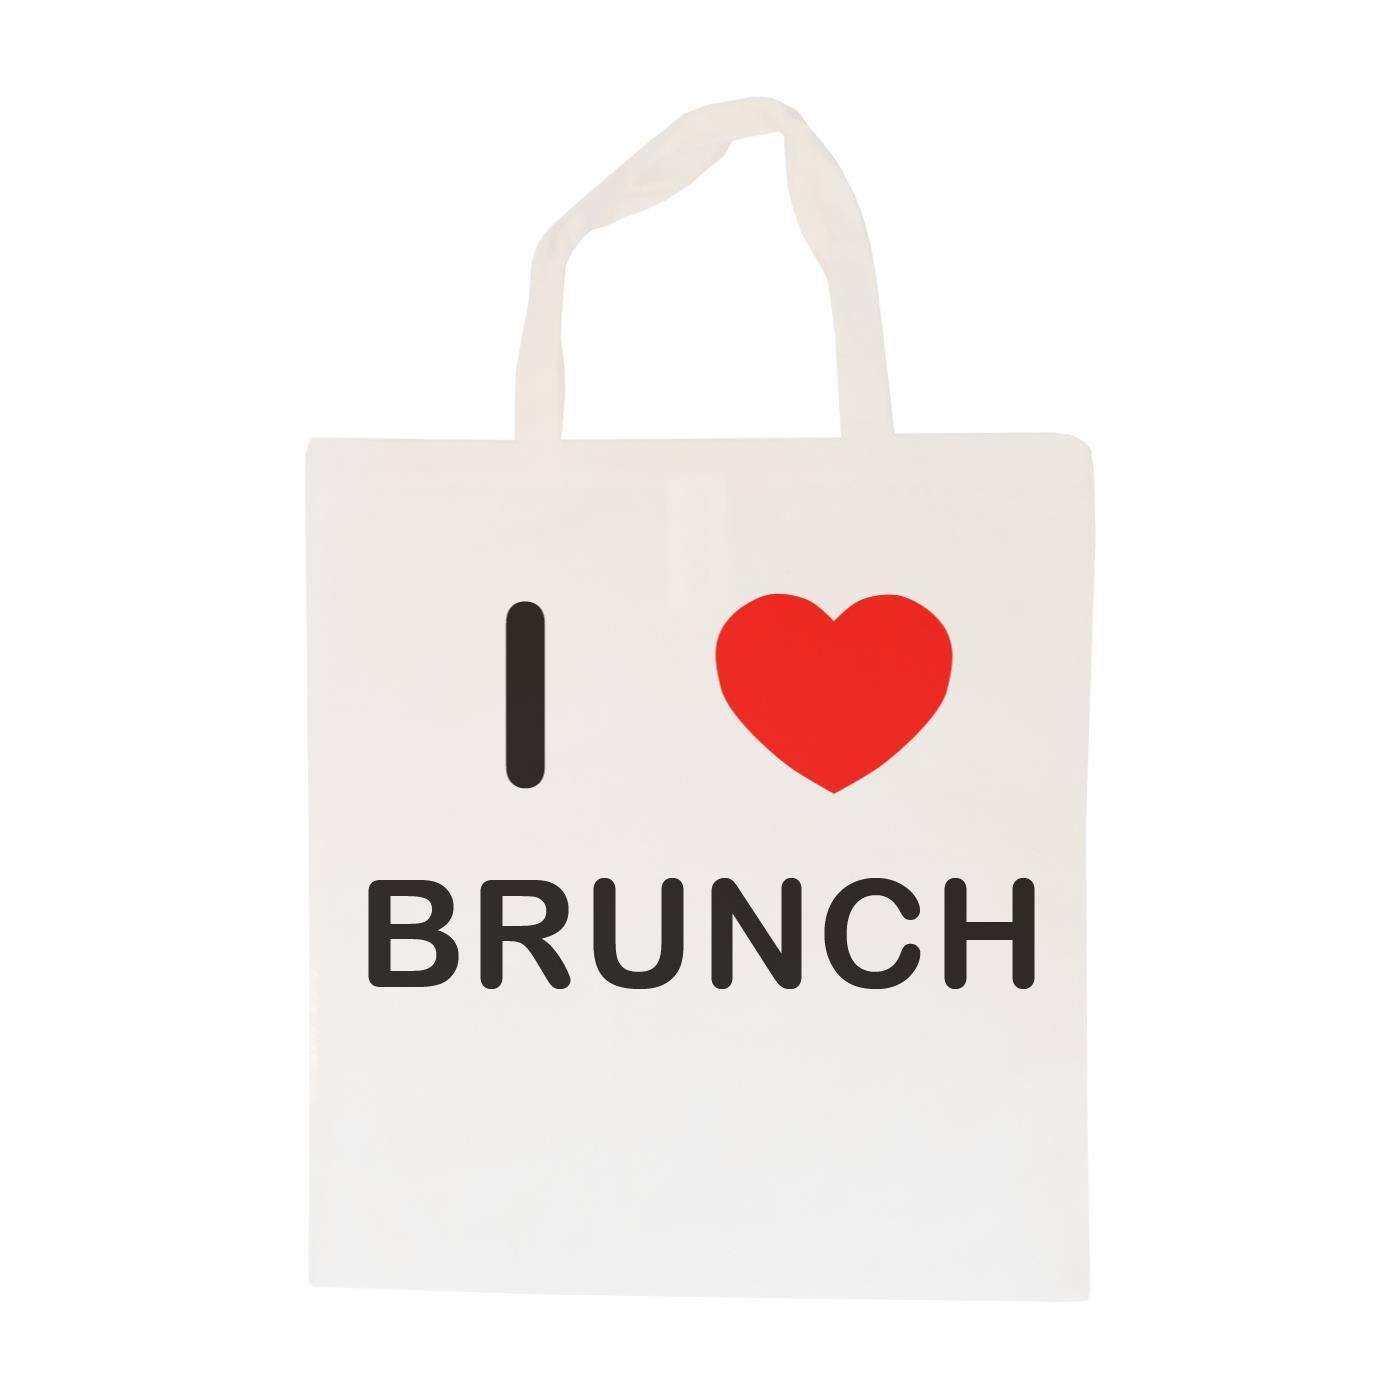 I Love Brunch - Cotton Bag | Size choice Tote, Shopper or Sling